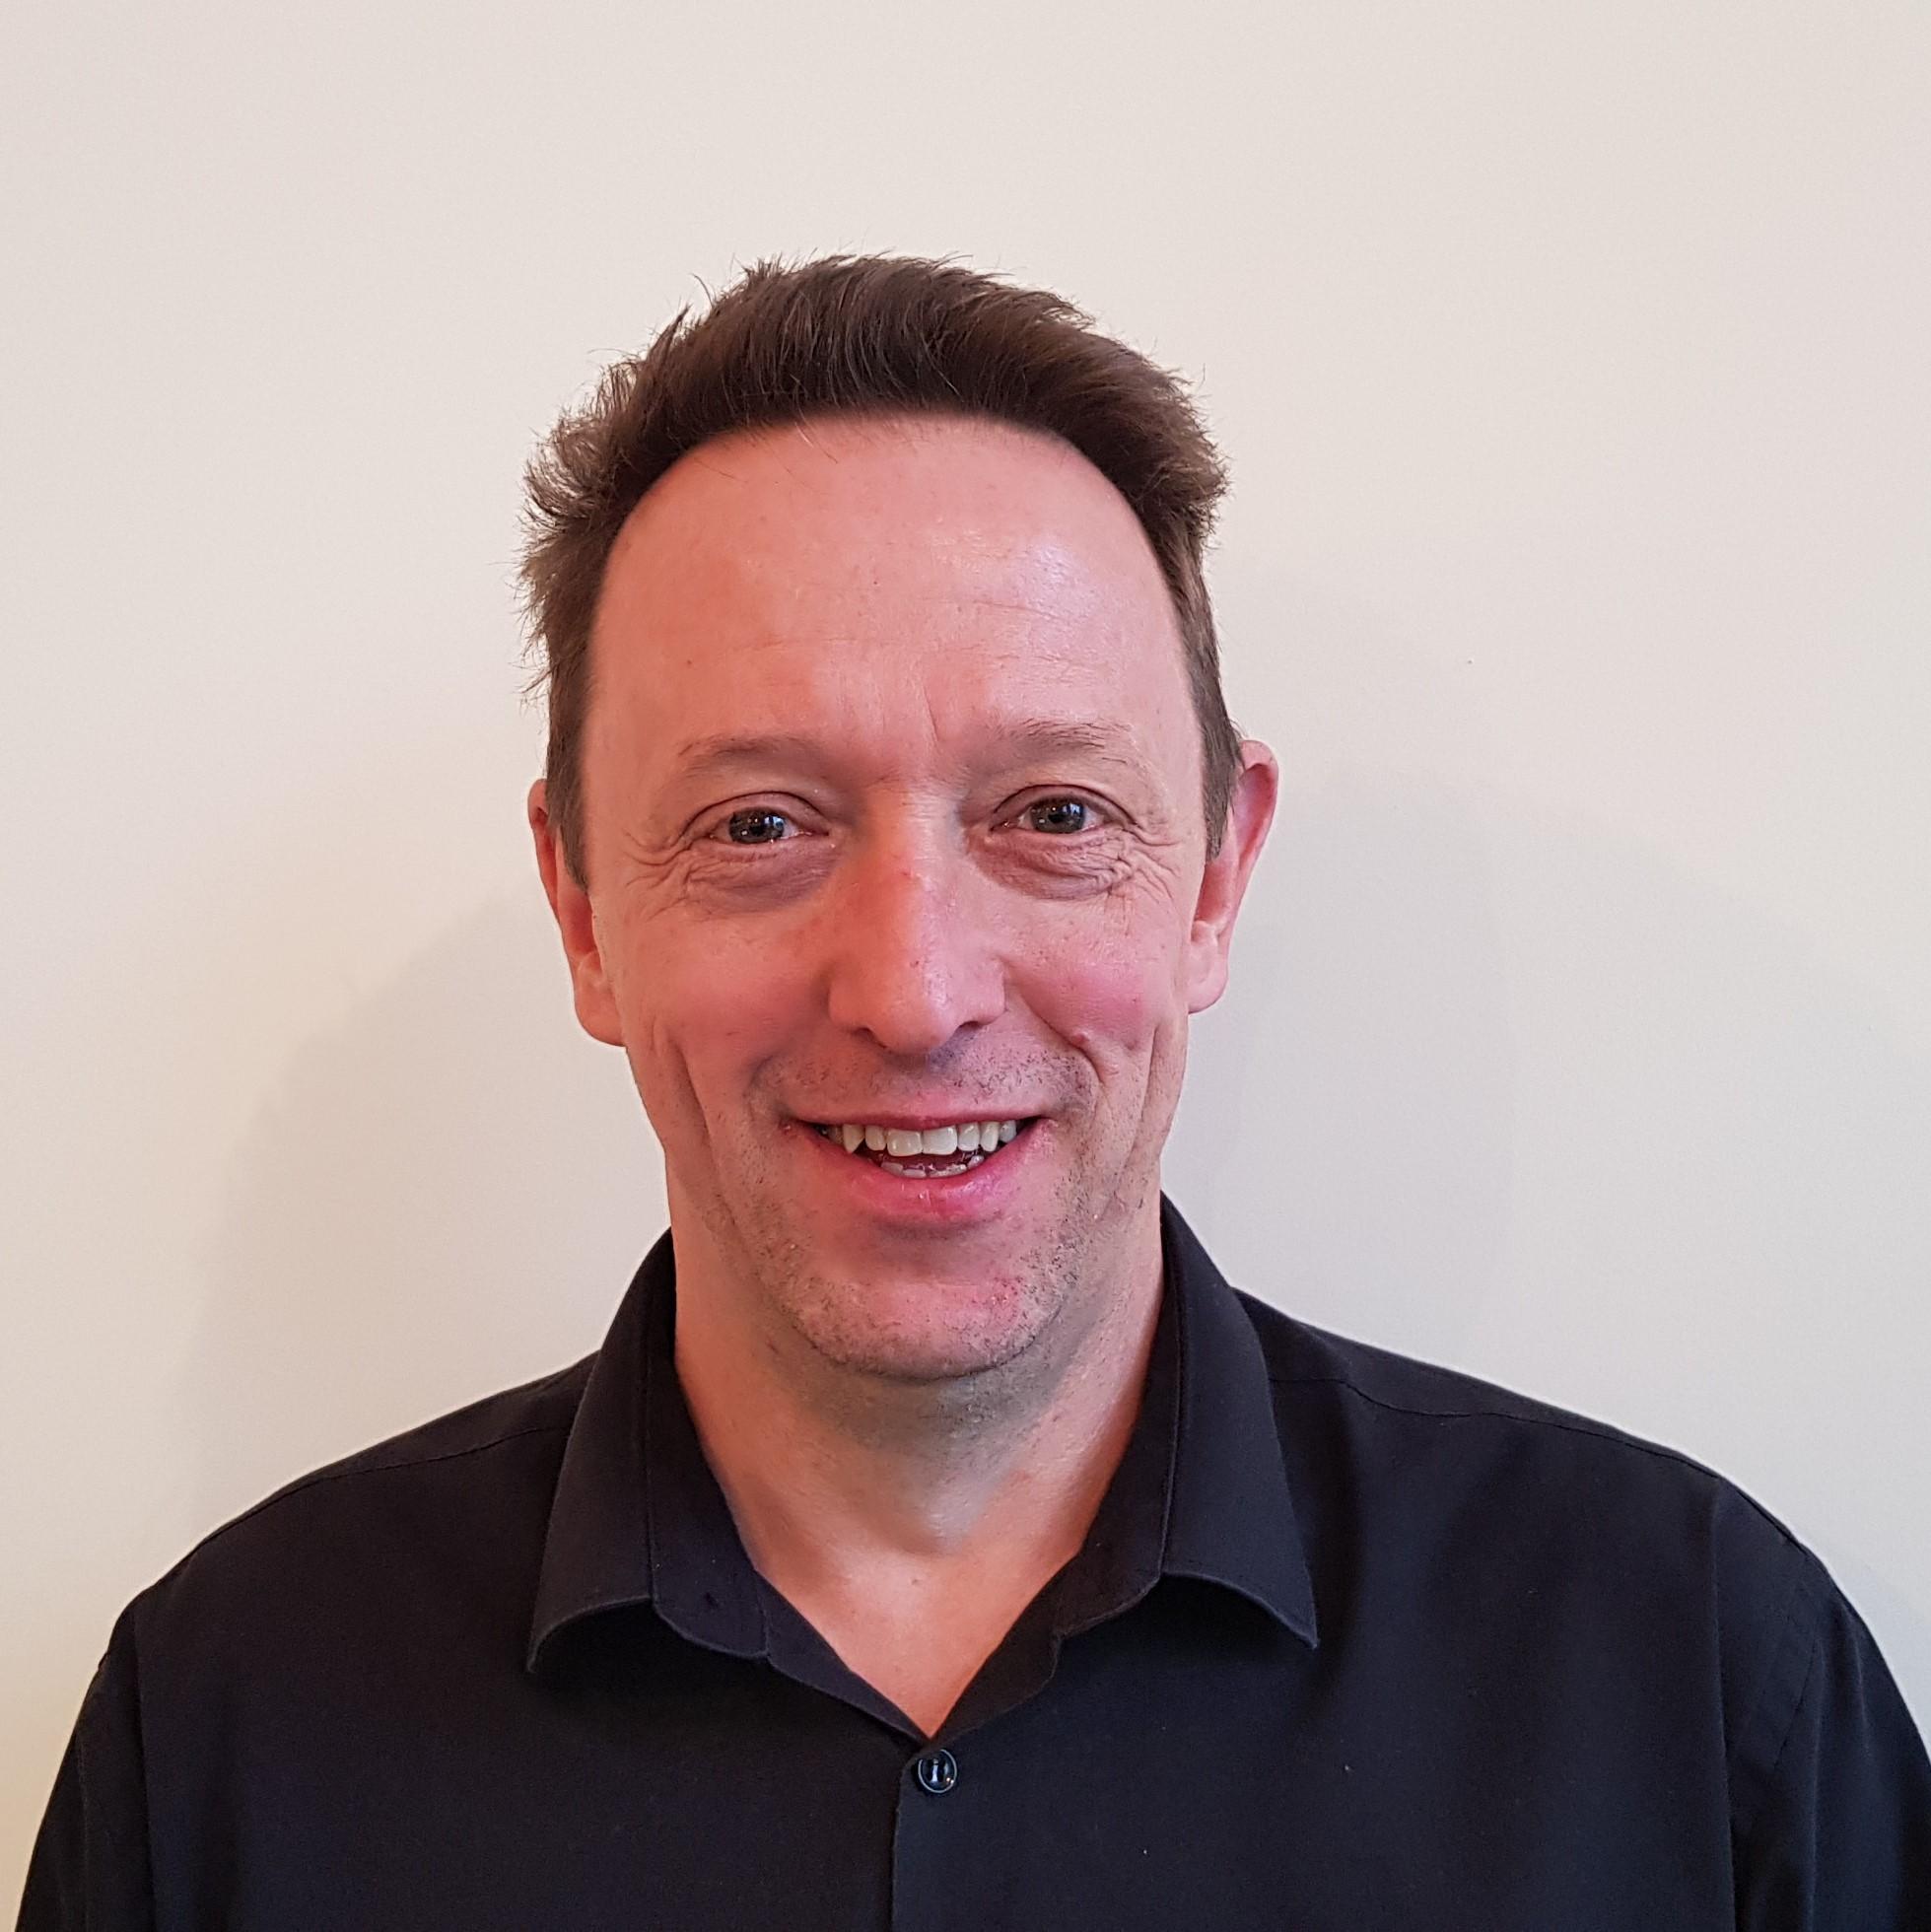 Martin Liebe